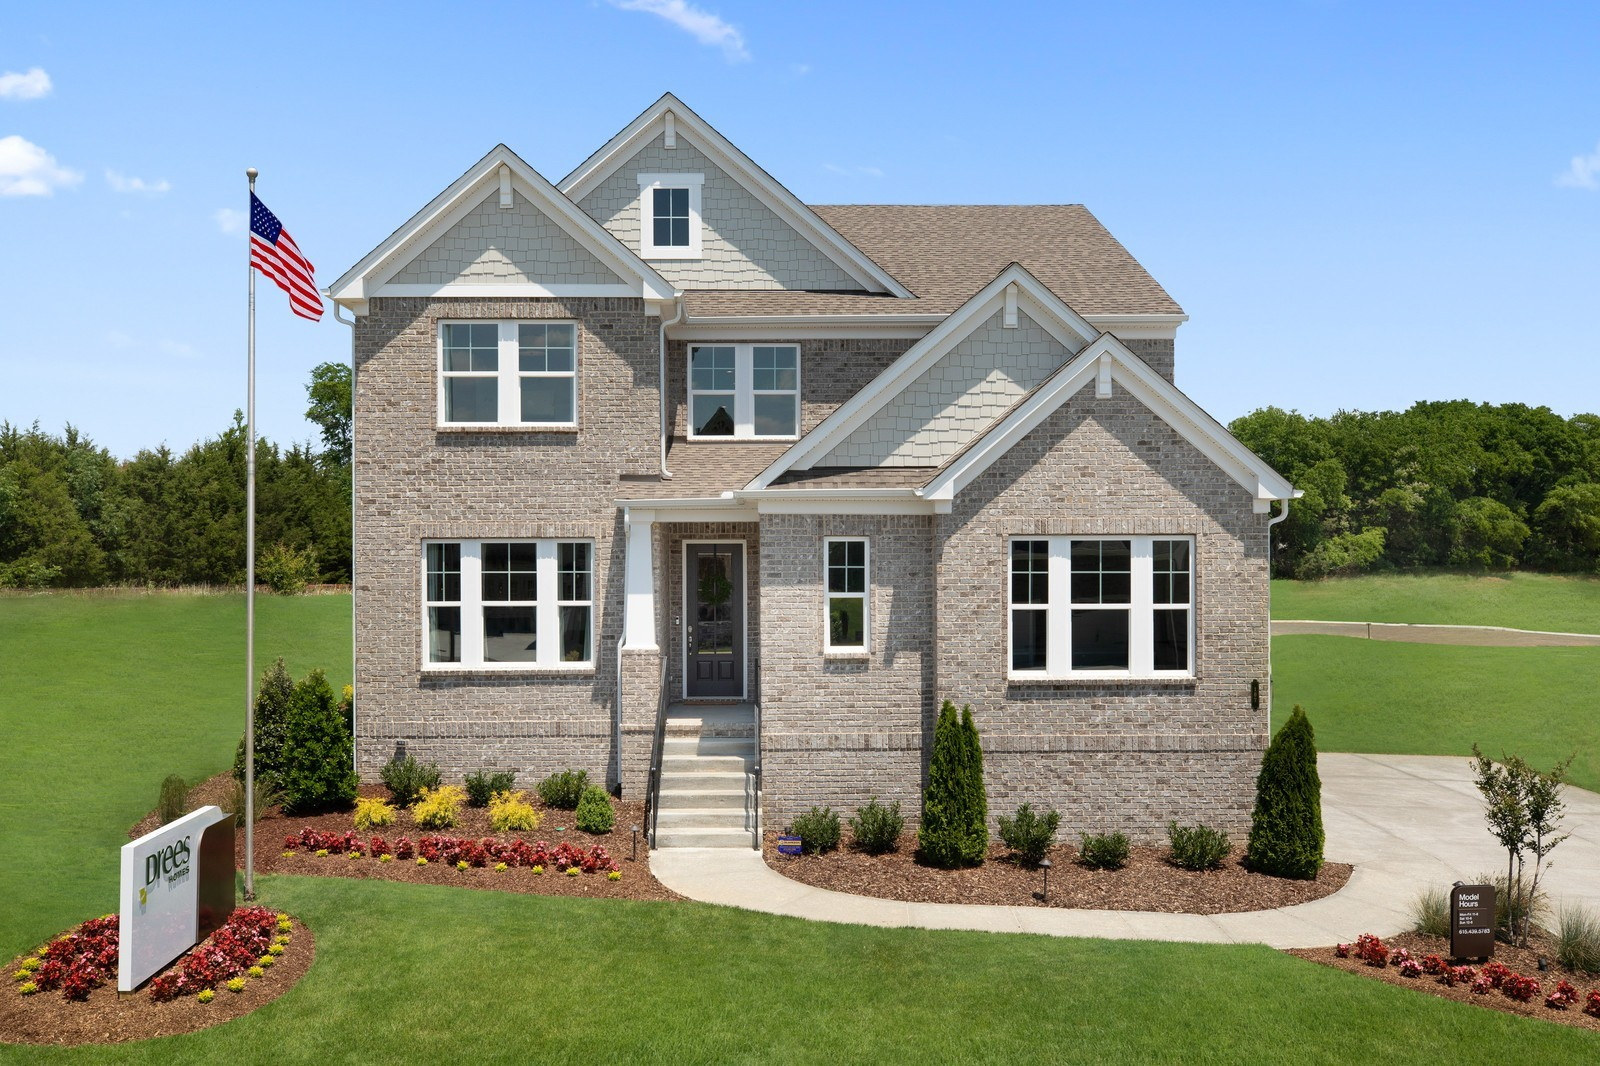 1076 River Oaks Blvd, Lebanon, TN 37090 - Lebanon, TN real estate listing